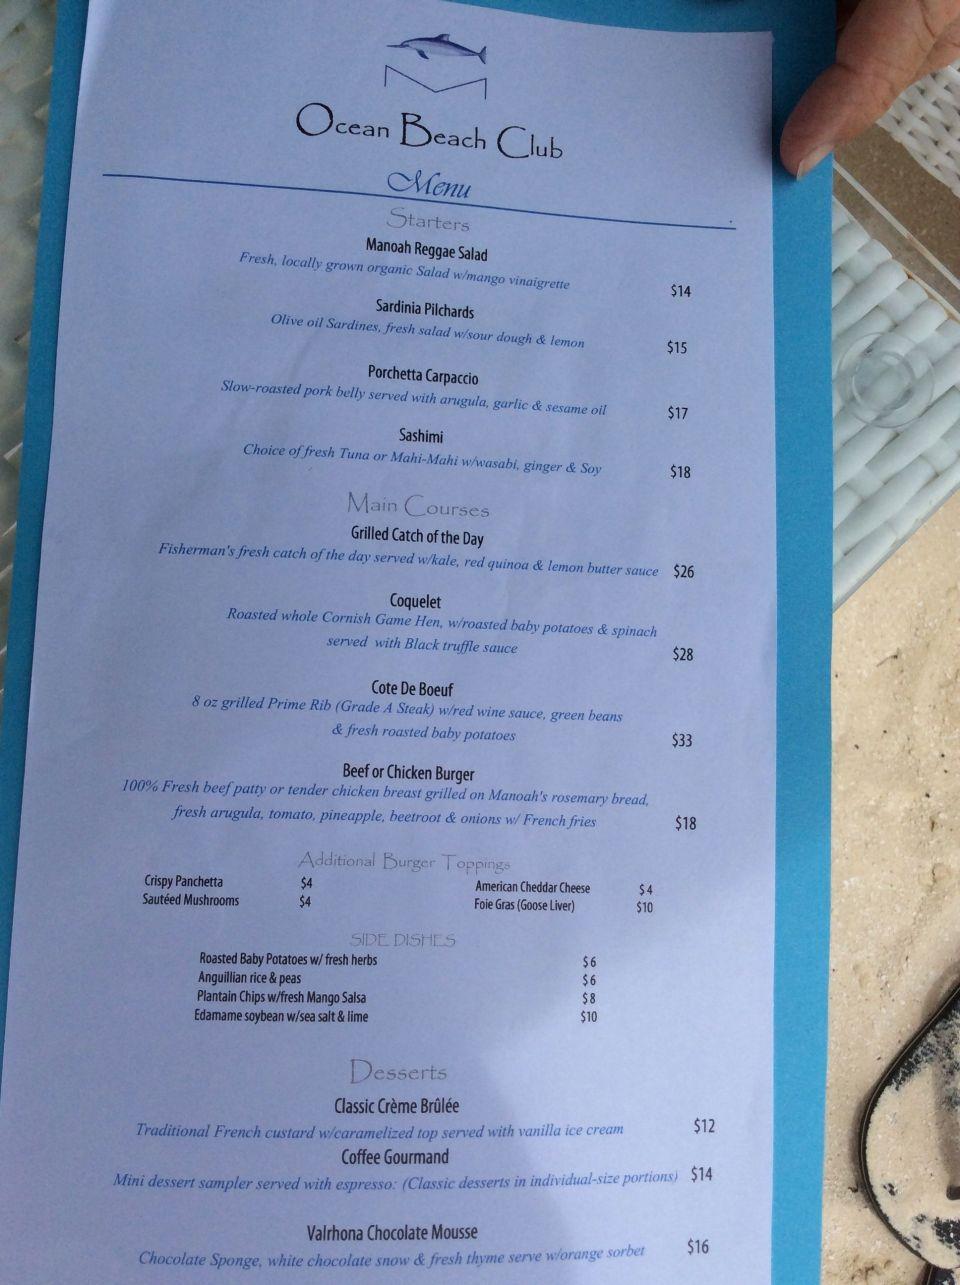 axa 2016 menu monoah.jpg